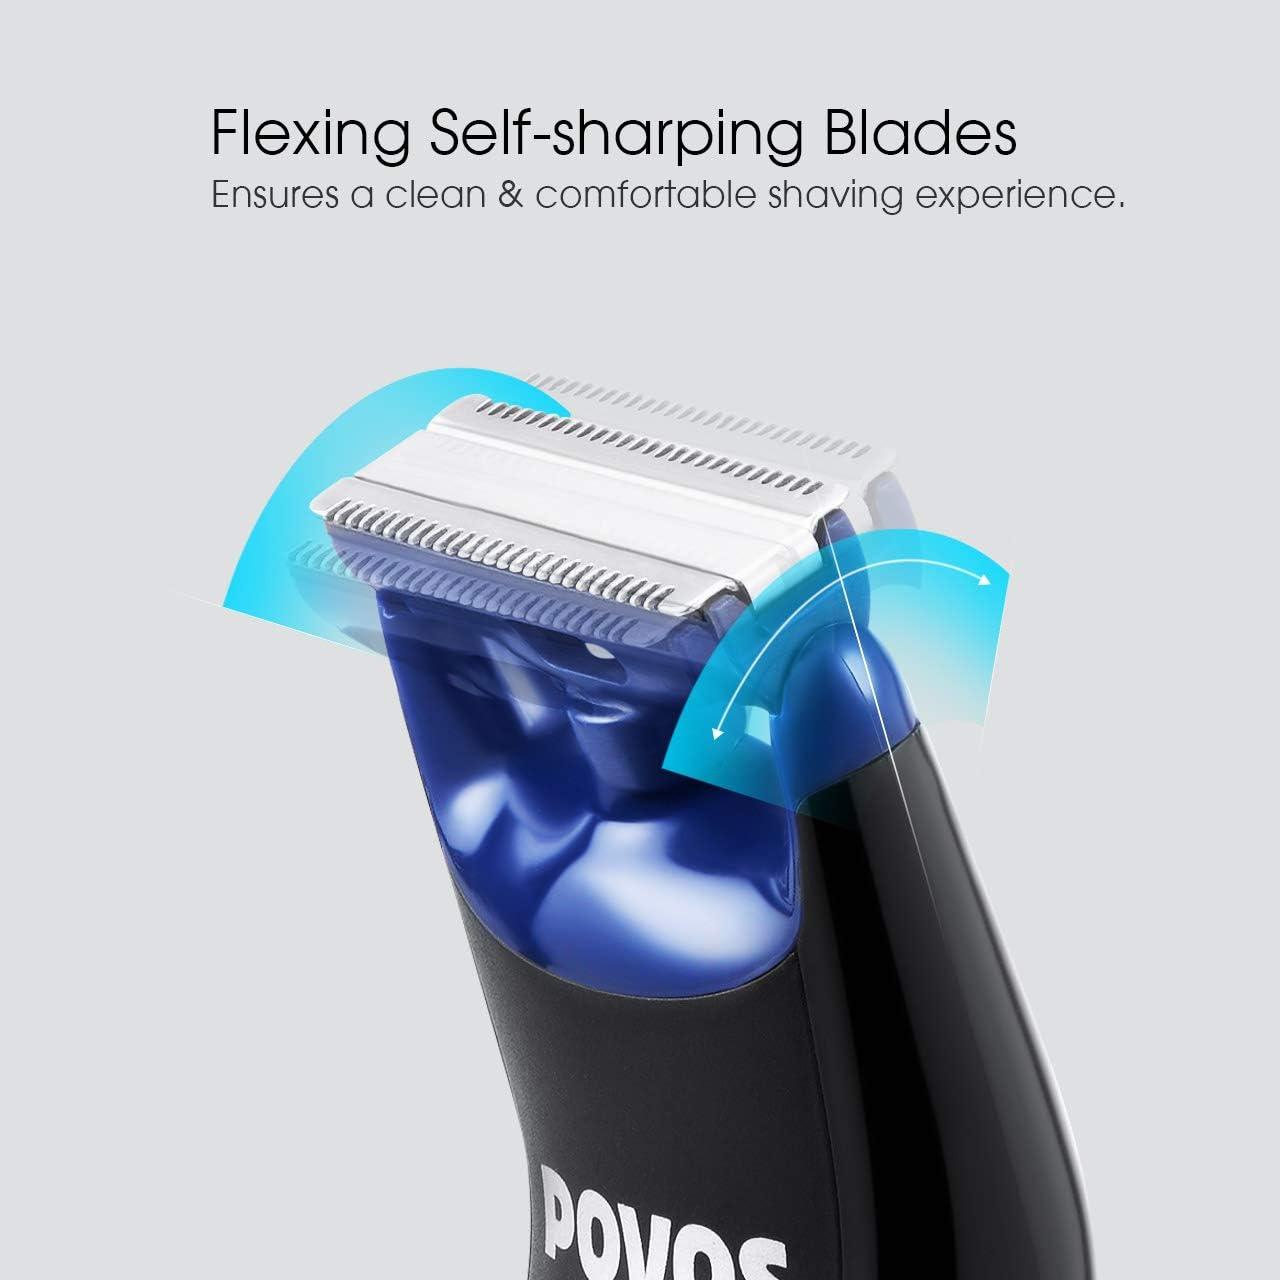 Povos Body Trimer One Blade recortador de barba bidireccional ...